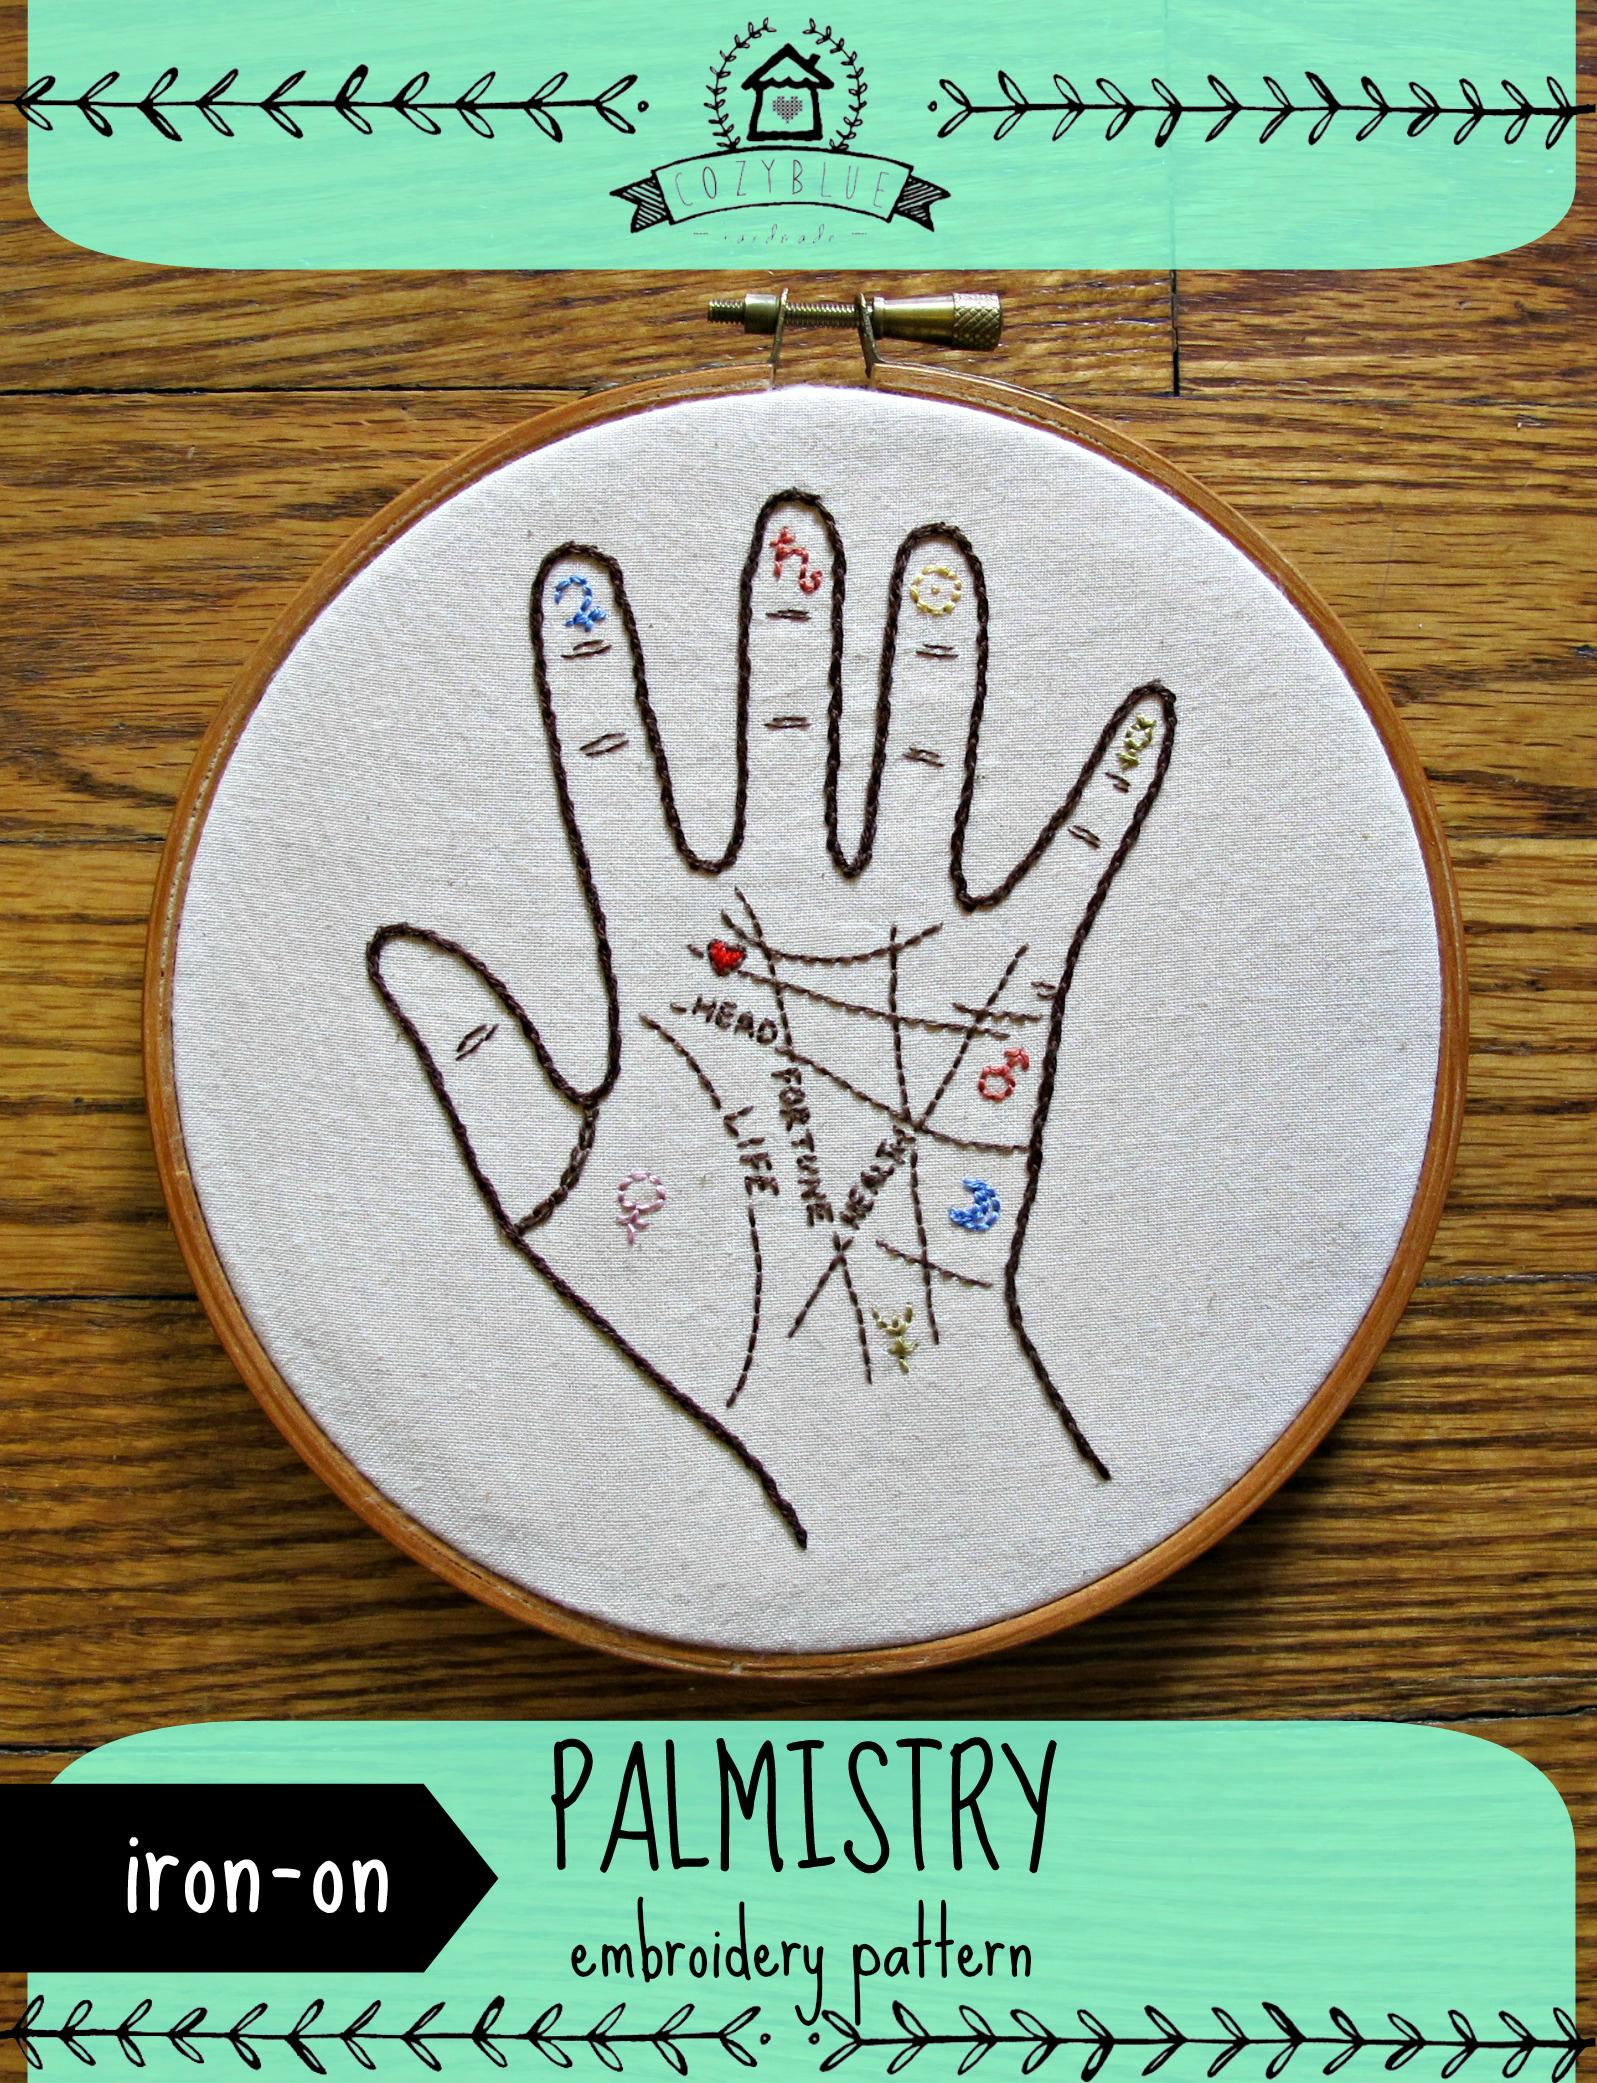 palmistrycard1.jpg